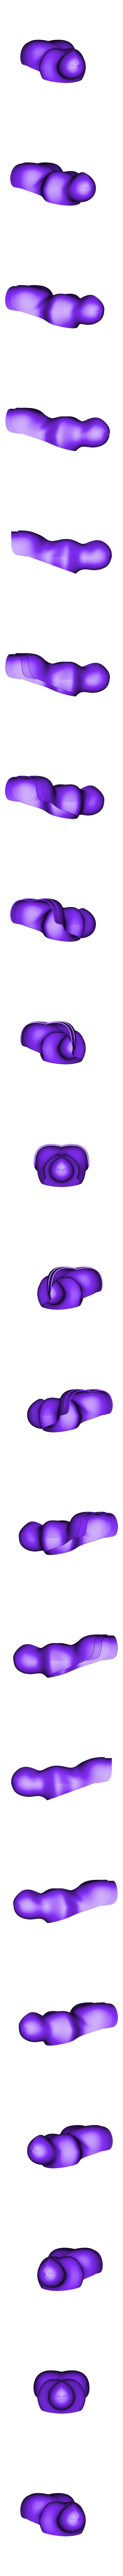 matriochka v3 a N2.stl Télécharger fichier STL gratuit WHITE MATRIOCHKA • Design pour impression 3D, DJER